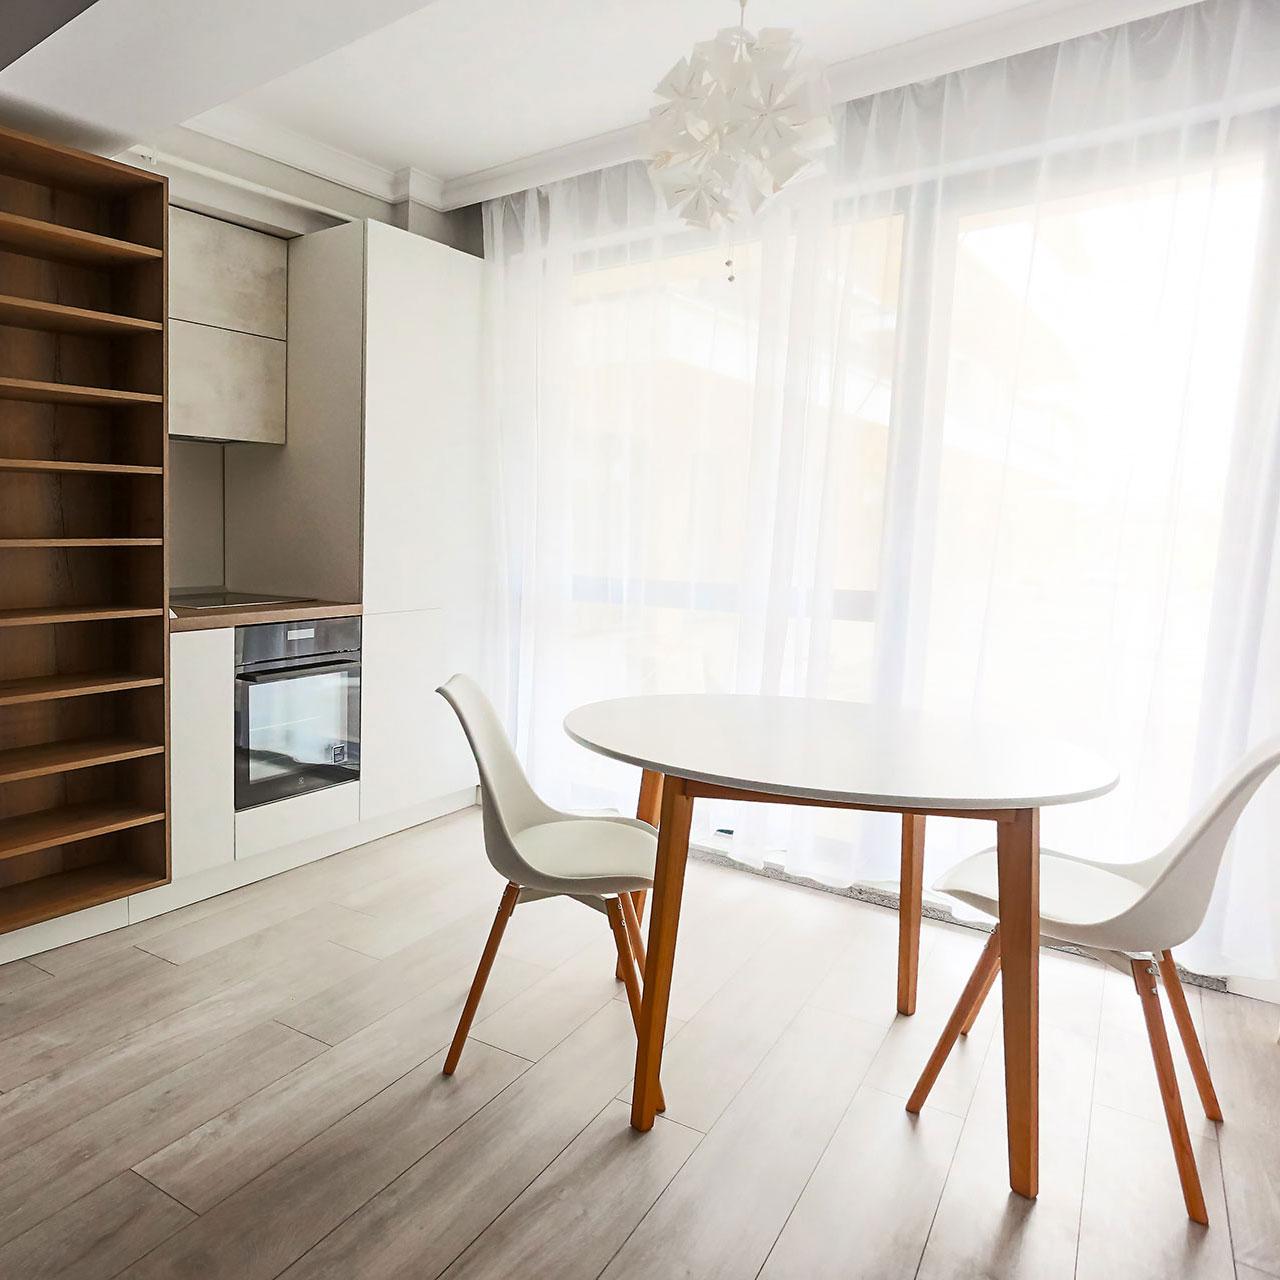 Apartamente de vanzare Bucuresti - Catedral Residence - Marriott, Piata Unirii, 13 Septembrie, Izvor - G4 - 2